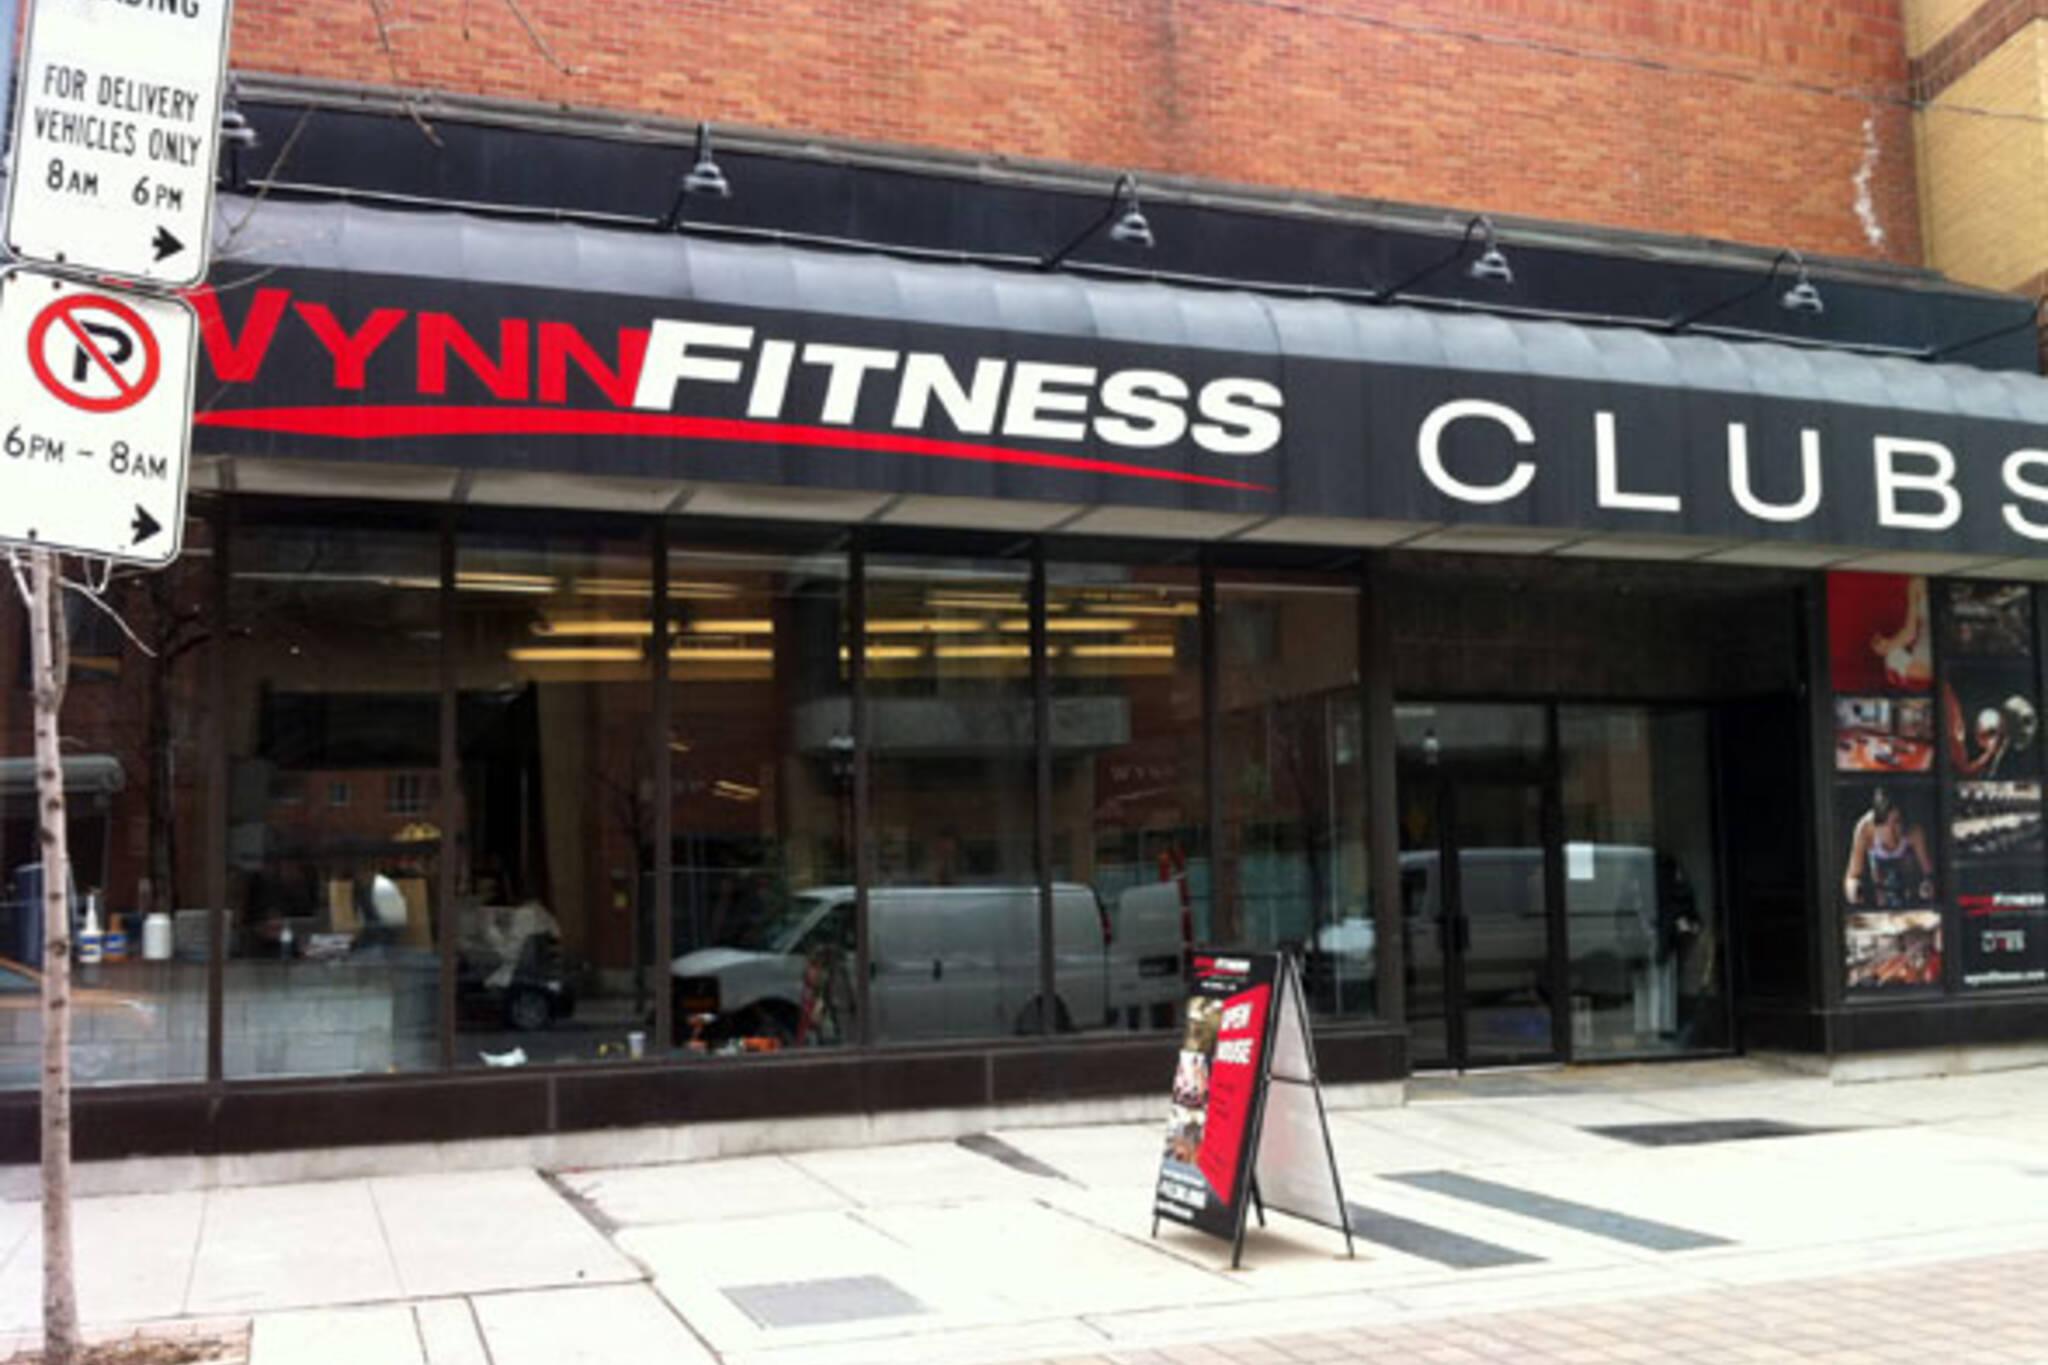 Wynn Fitness Toronto